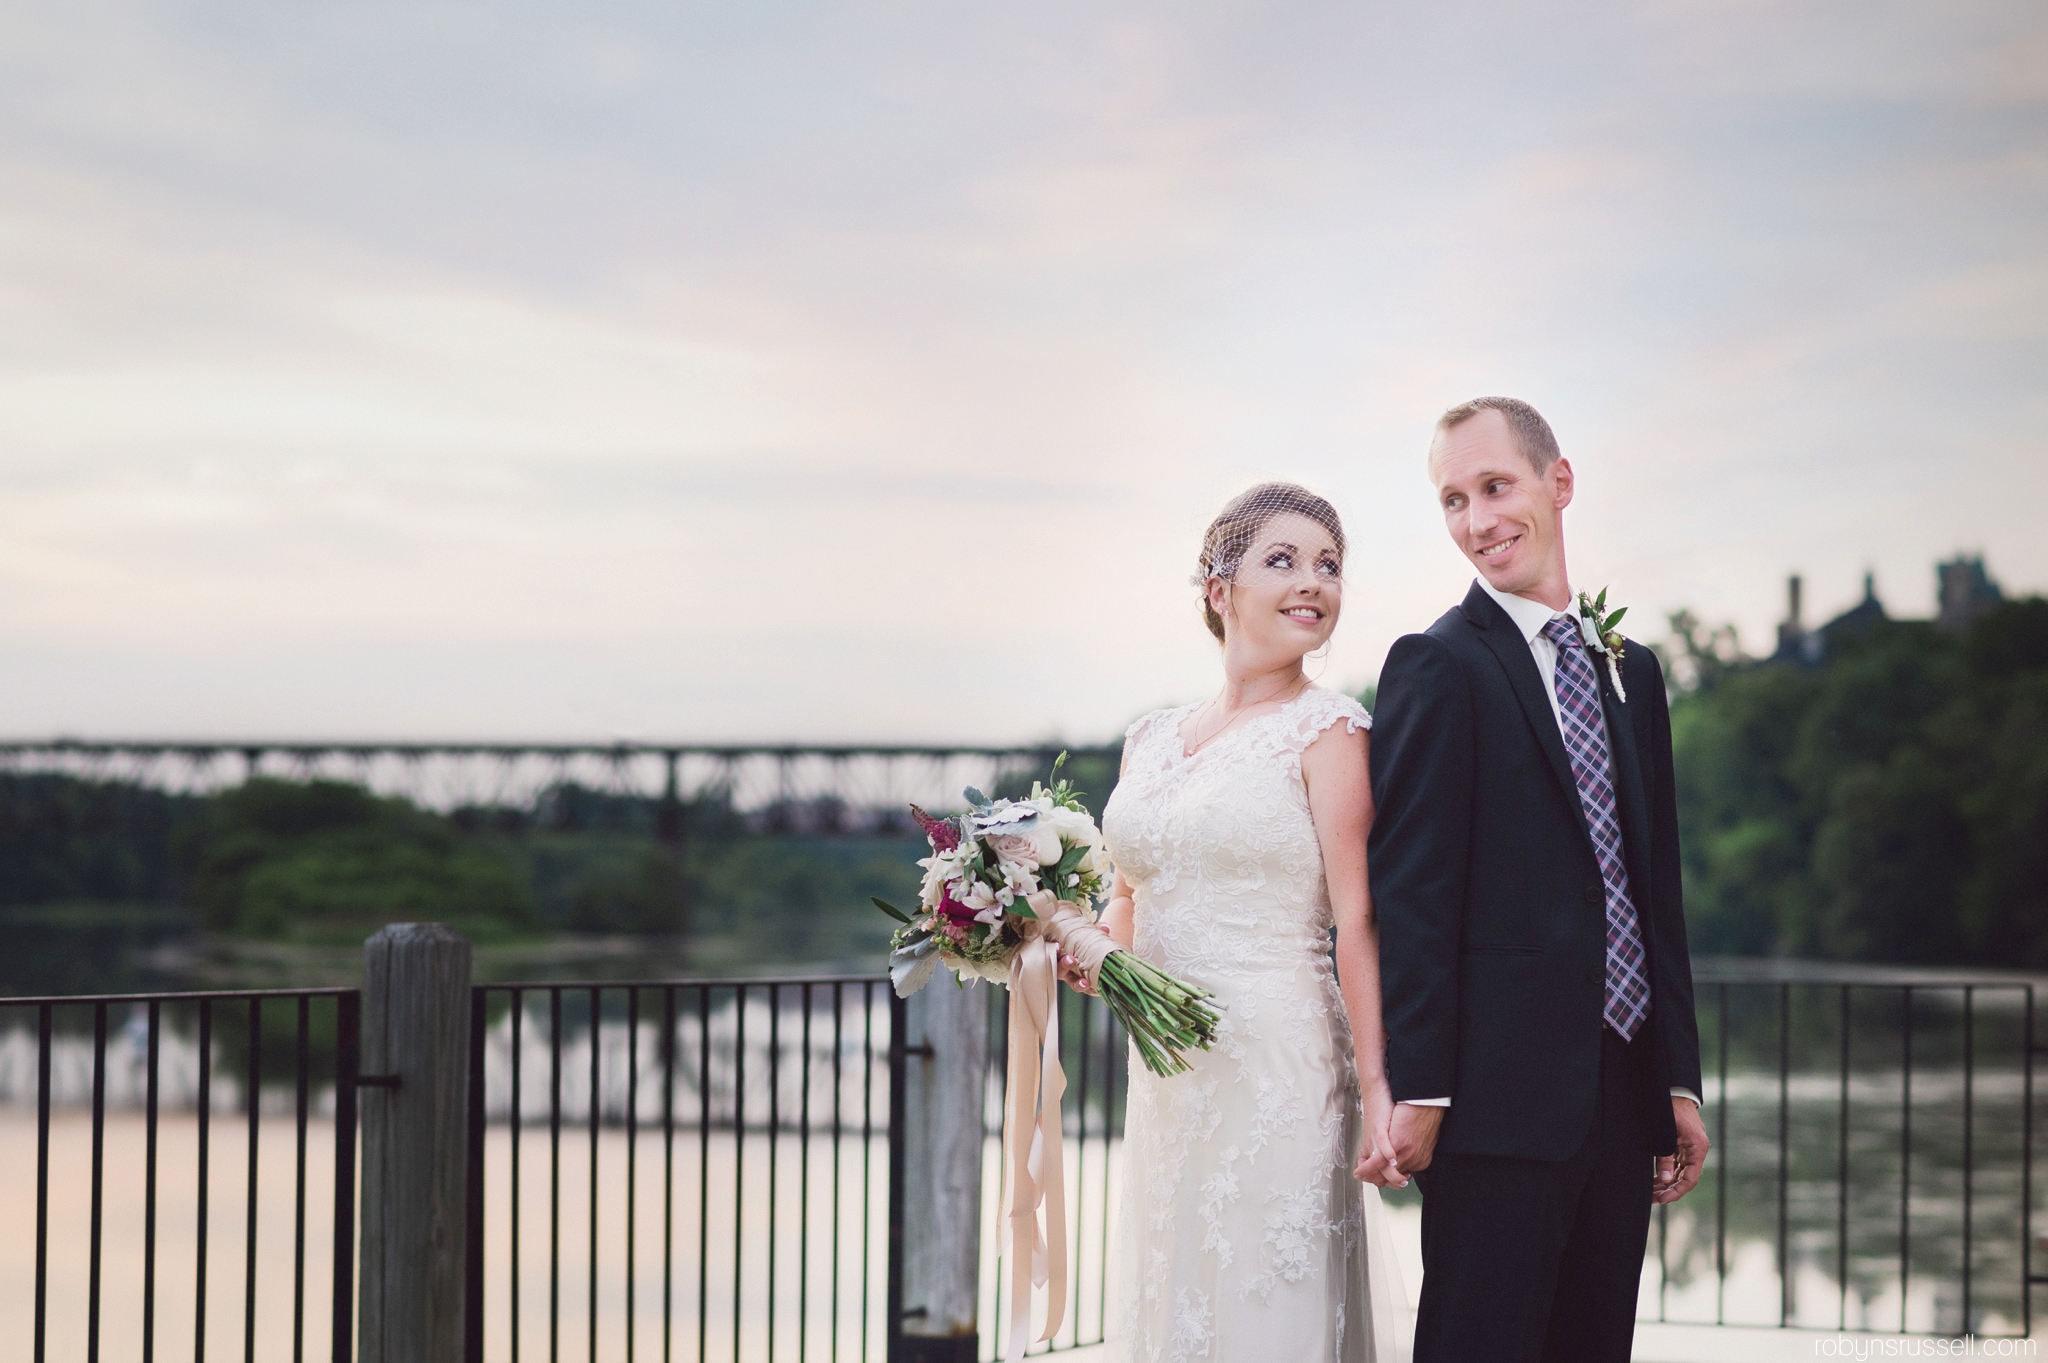 48-bride-and-groom-sunset-wedding.jpg